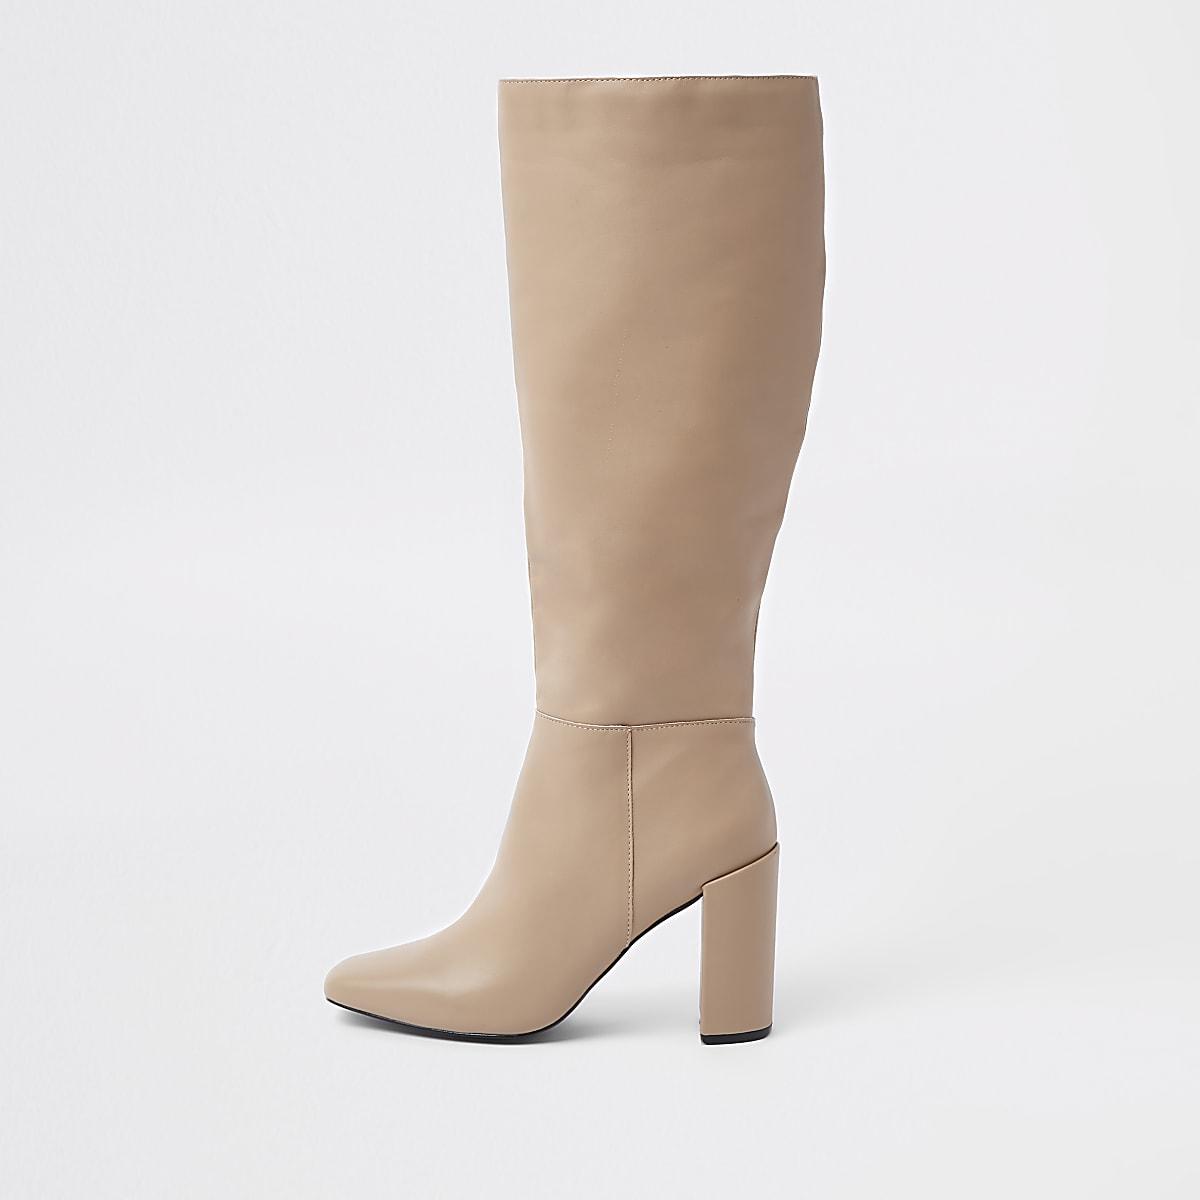 Cream leather block heel knee high boots